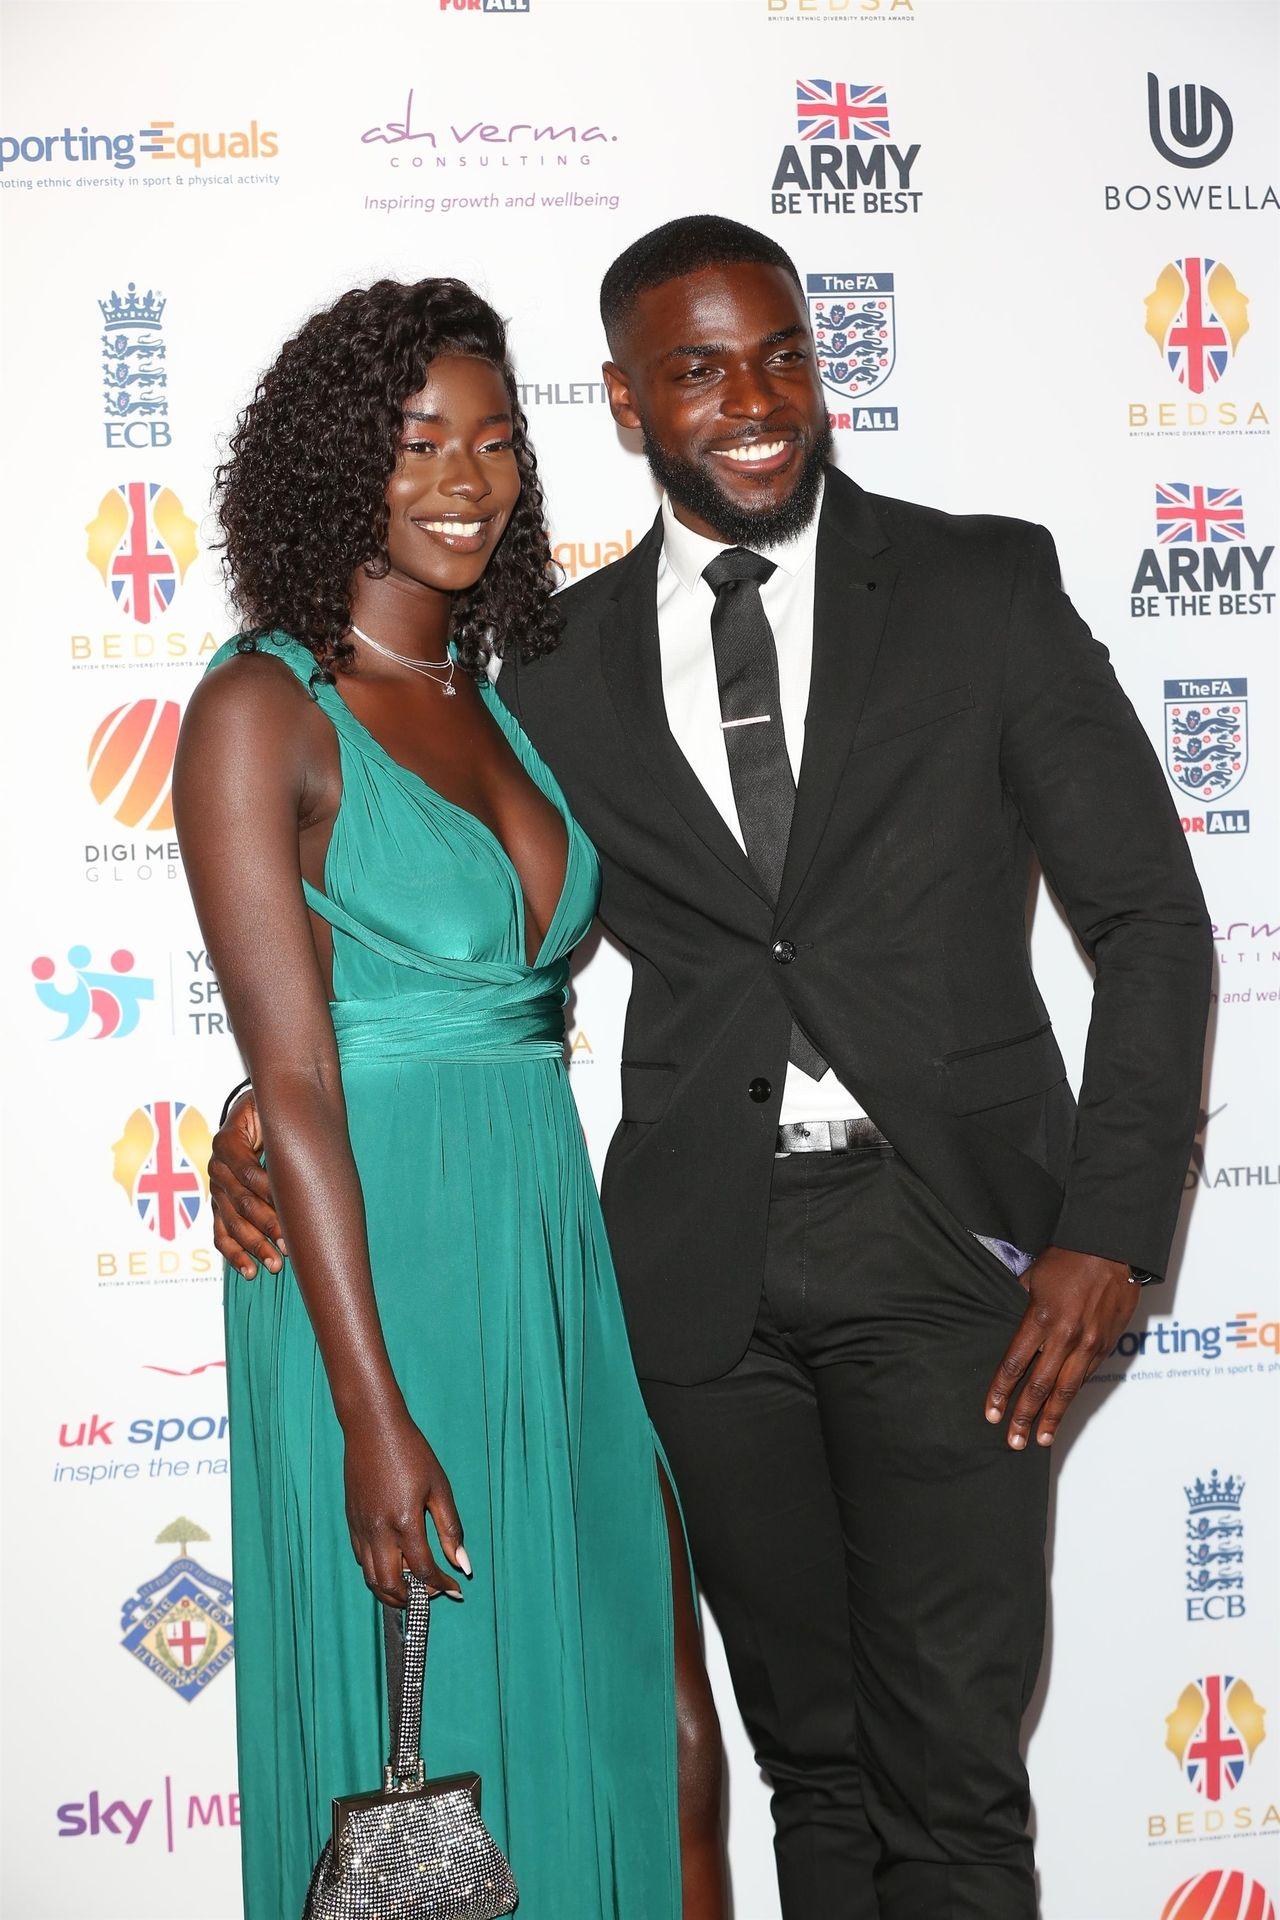 Mike Boateng & Priscilla Anyabu Are Seen At British Ethnic Diversity Sports Awards 0005